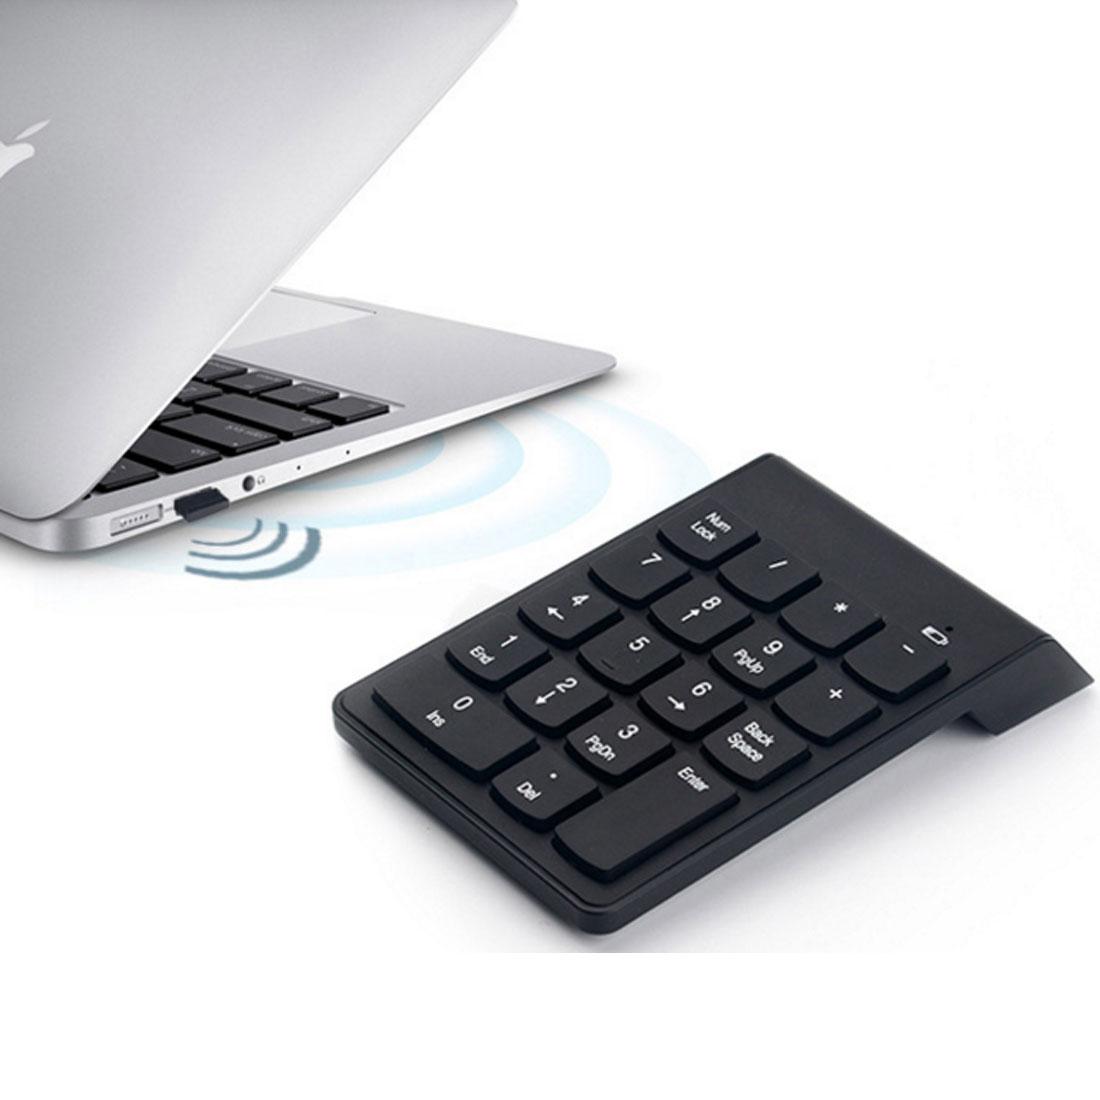 Notebook samsung com teclado numerico - De Alta Calidad Mini Teclado Num Rico De 18 Teclas Teclado Digital 2 4g Usb Teclado Num Rico